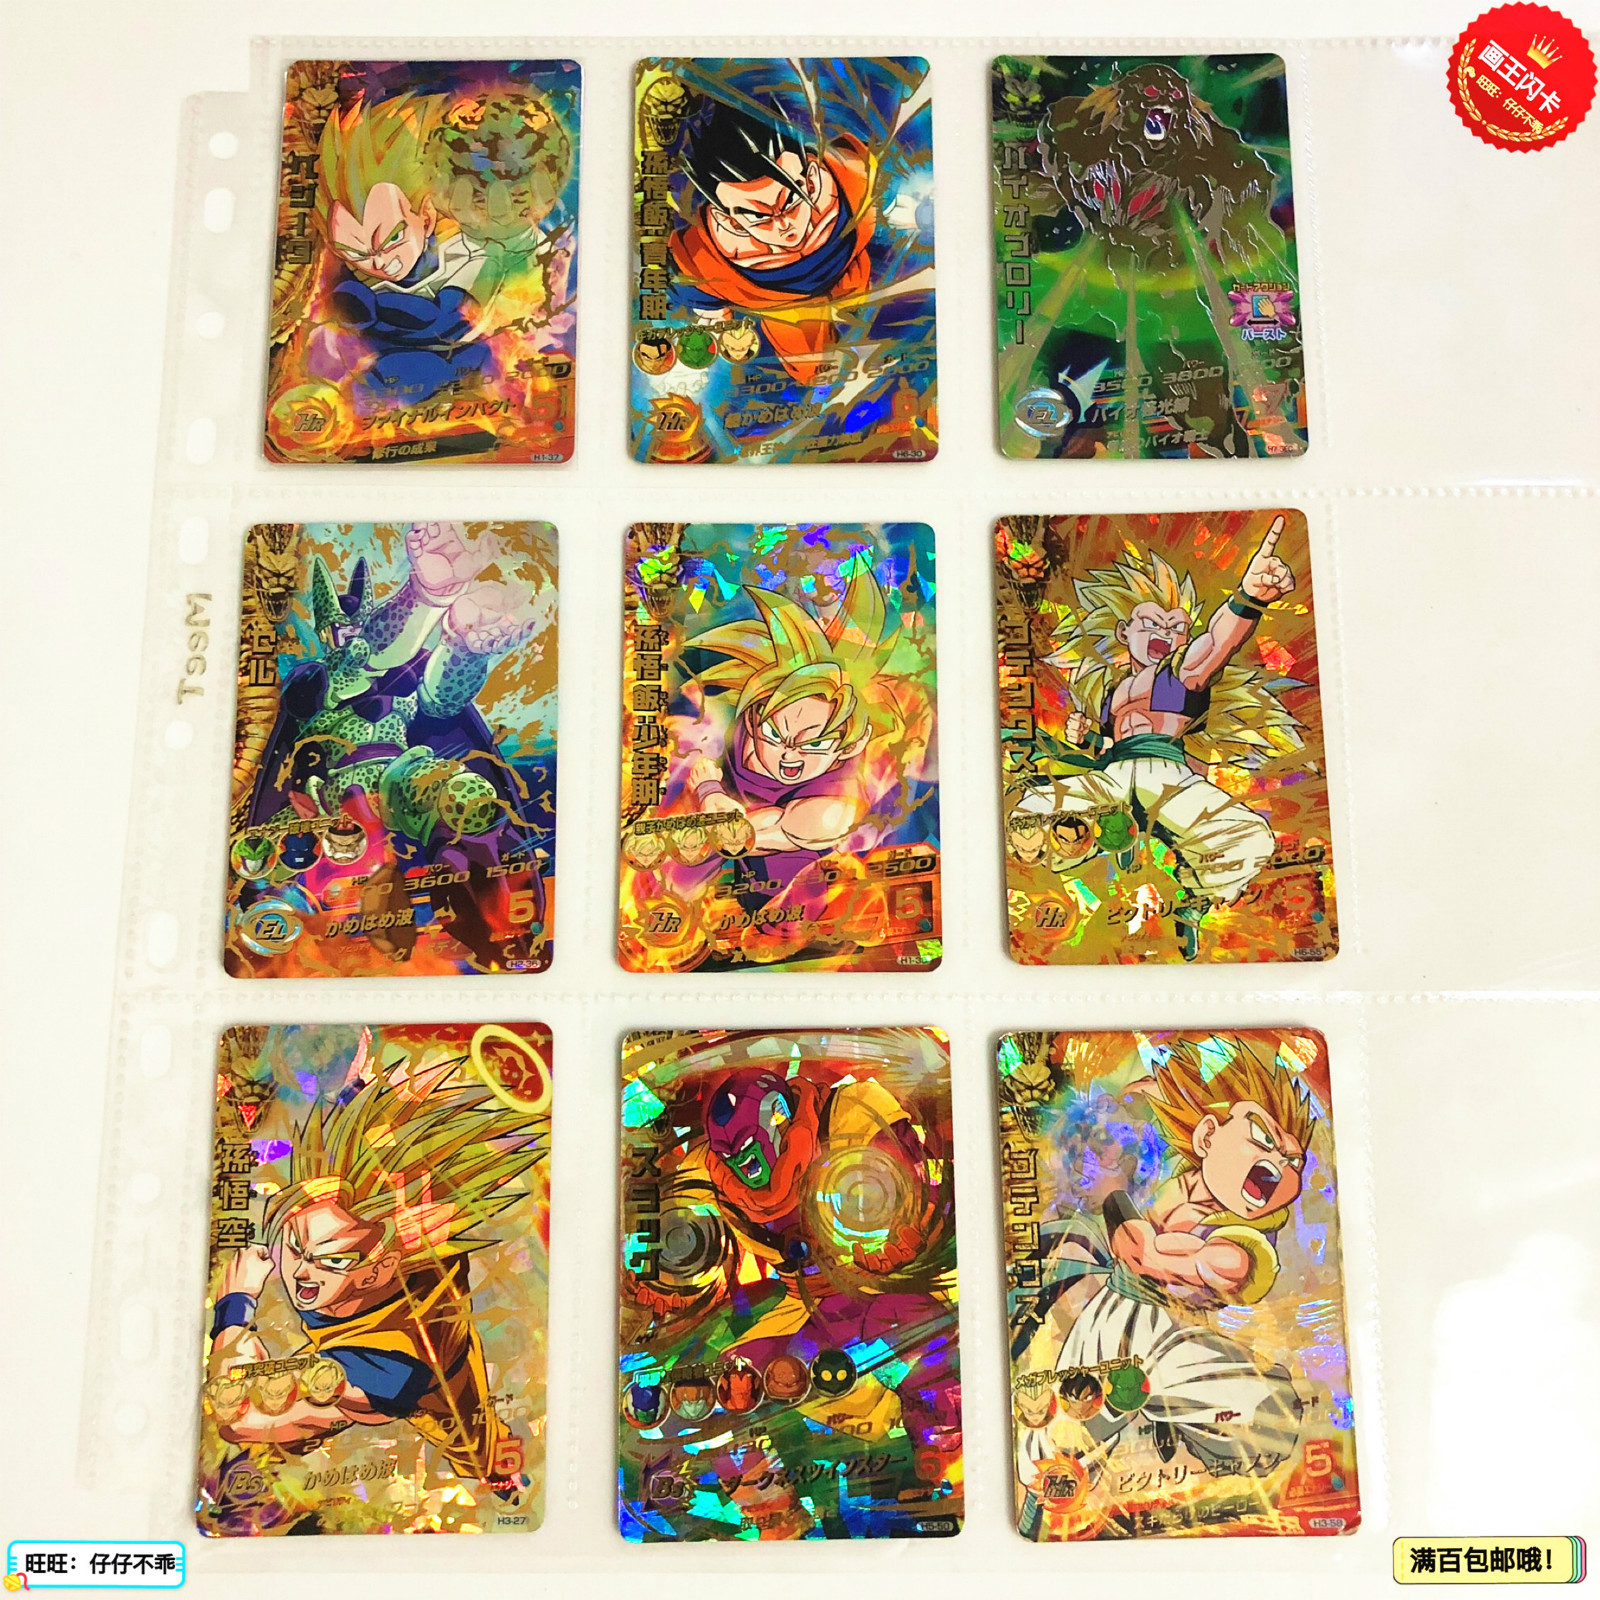 Japan Original Dragon Ball Hero Card SEC 4 Stars UR H Goku Toys Hobbies Collectibles Game Collection Anime Cards